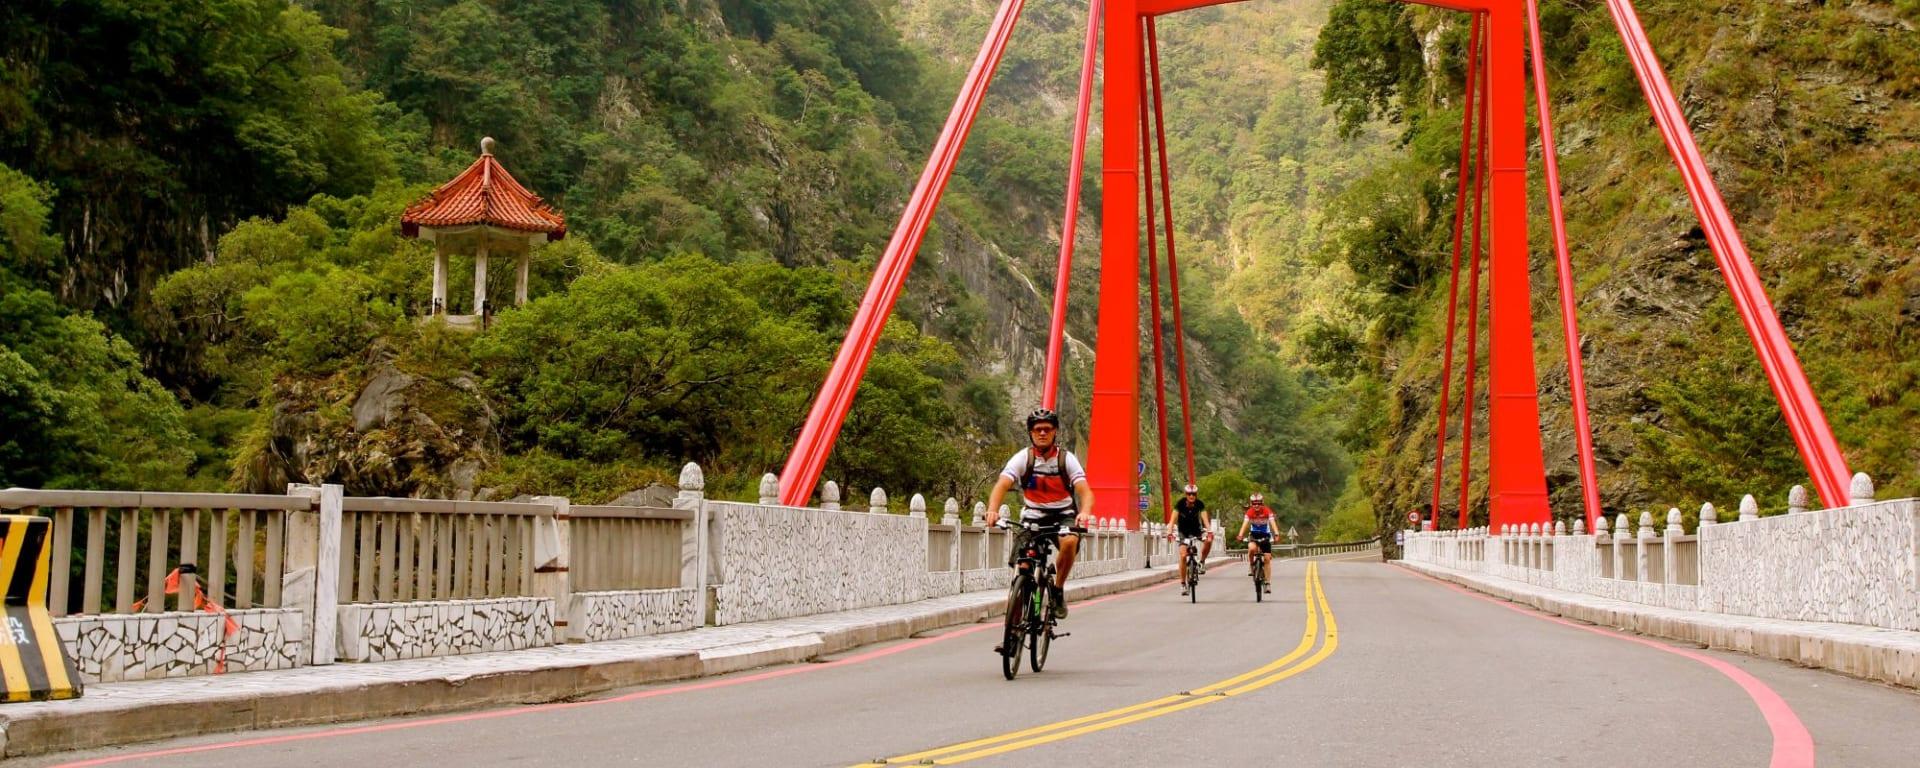 Bike Taiwan - Velotour entlang der Ostküste ab Taipei: Bike Taiwan